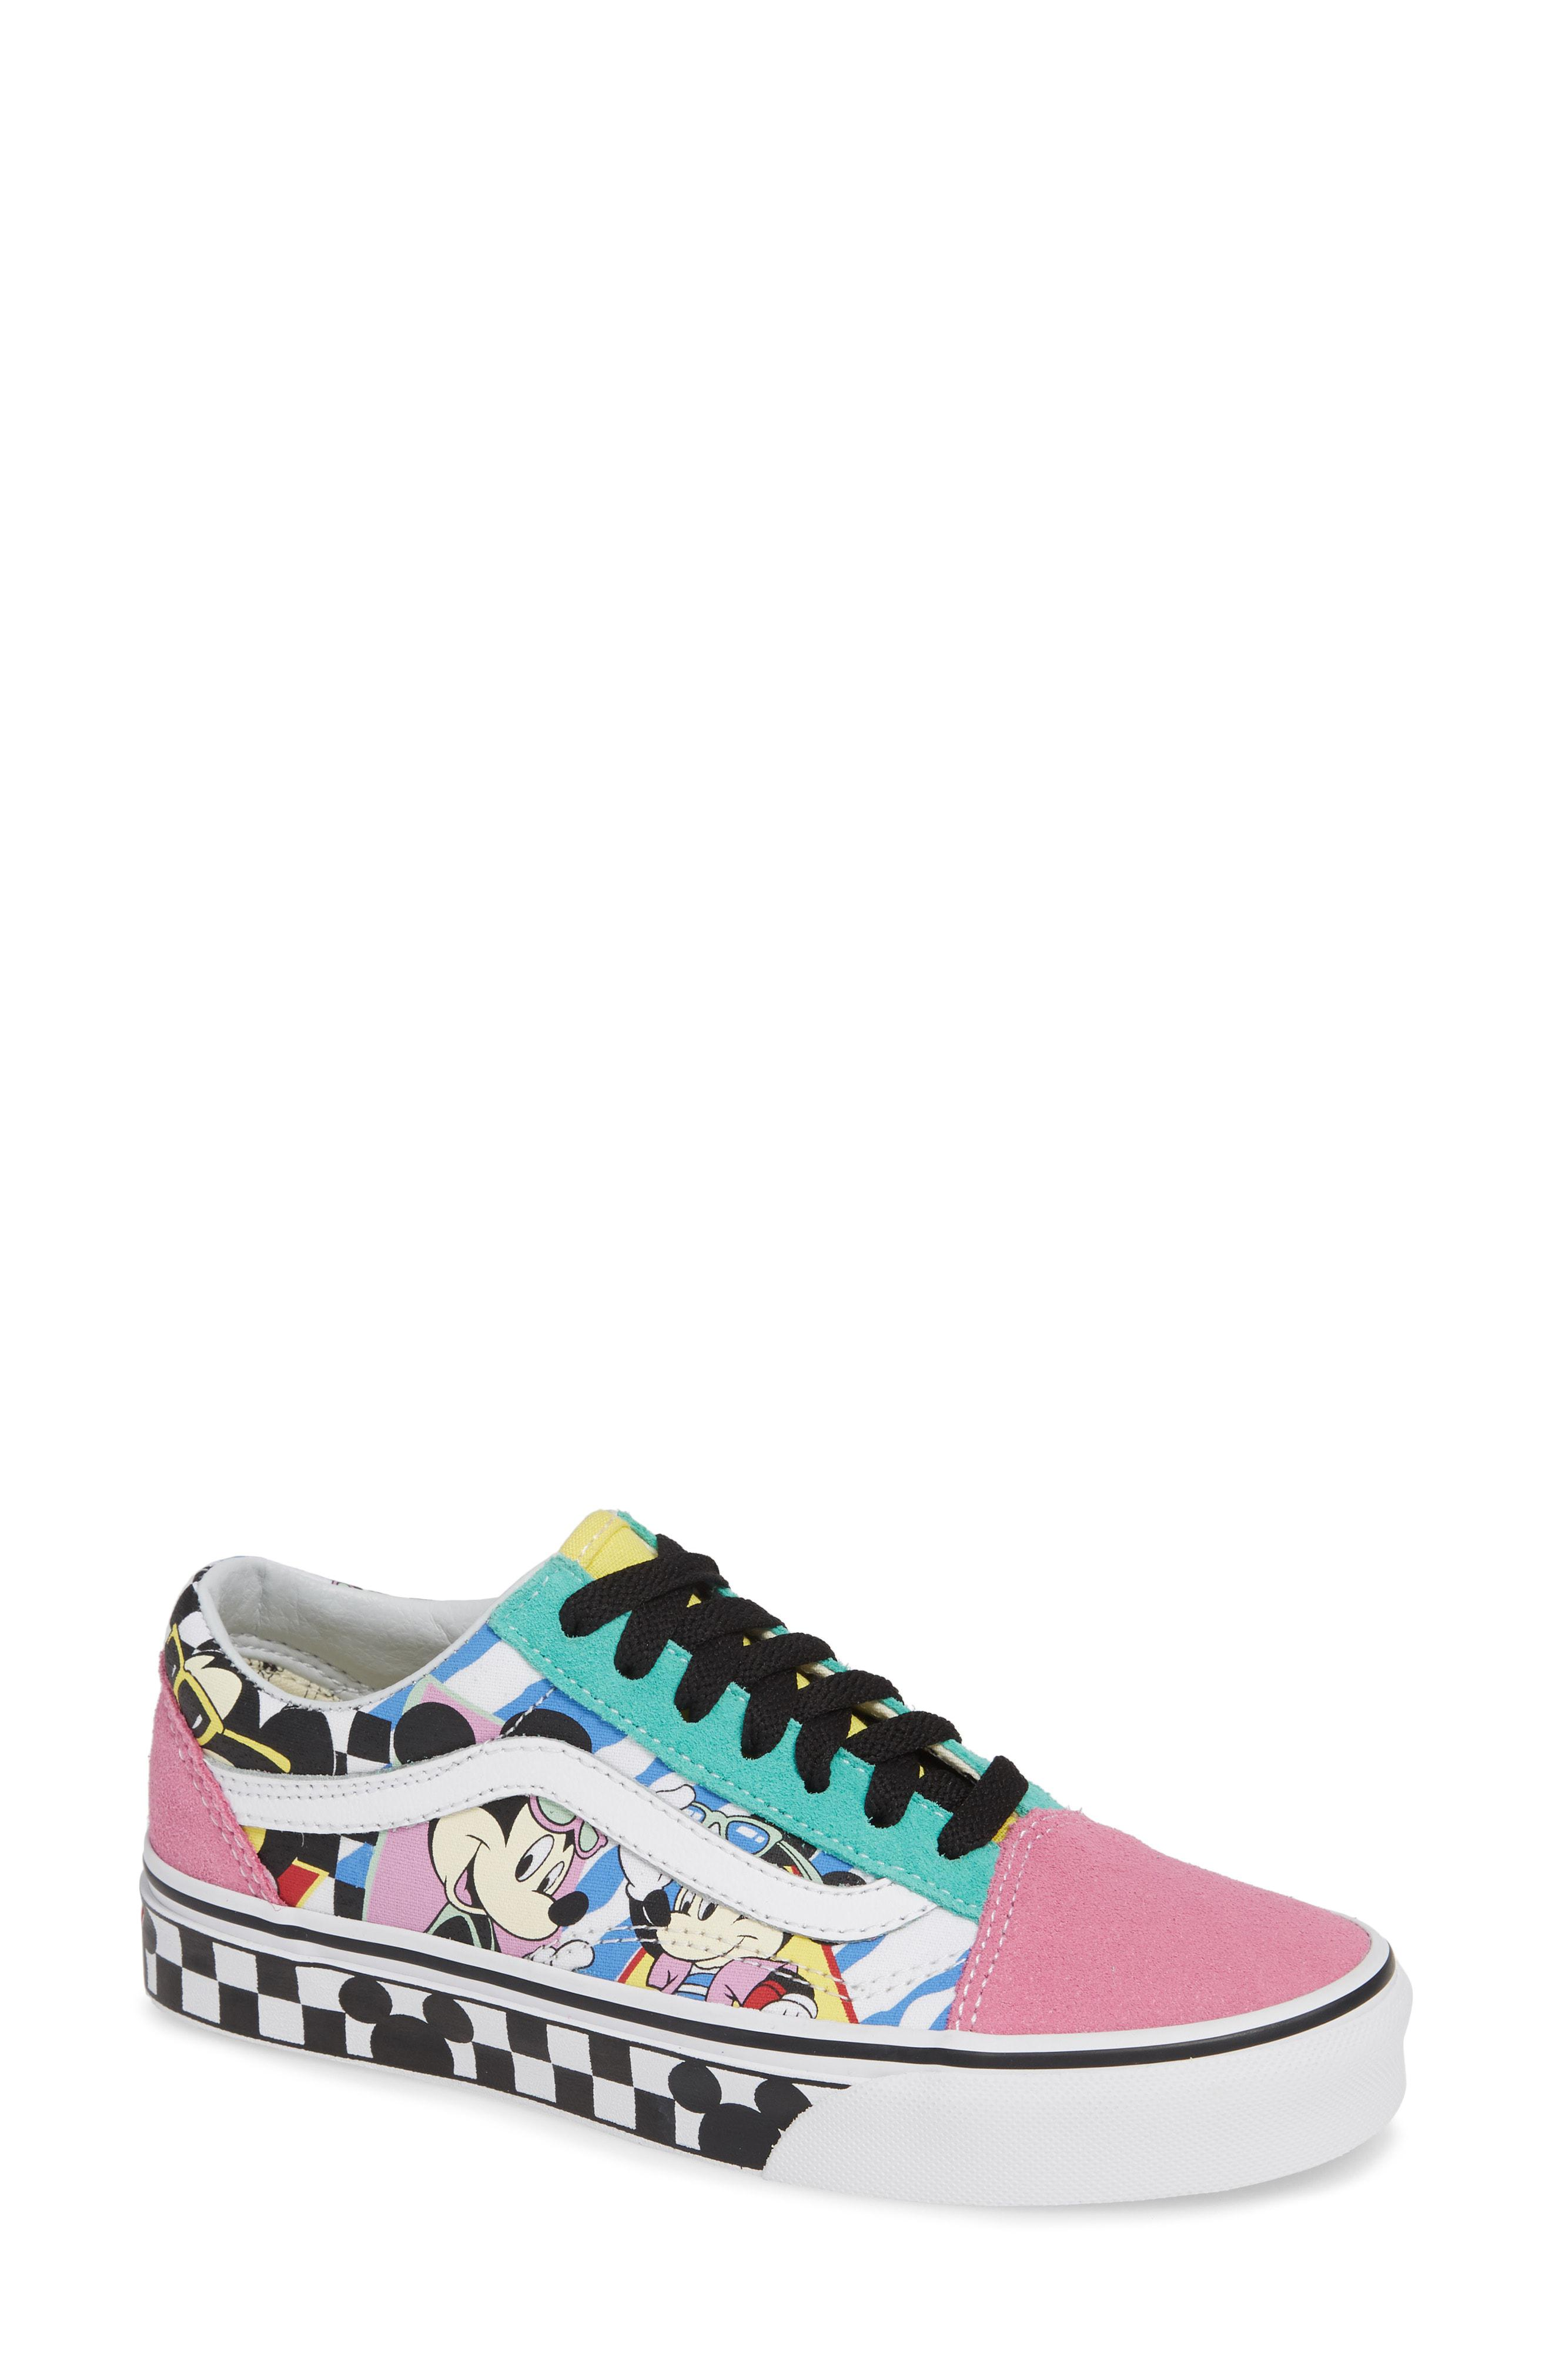 0f0febce92c Lyst - Vans X Disney Mickey Mouse Ua Old Skool Low-top Sneaker in Green